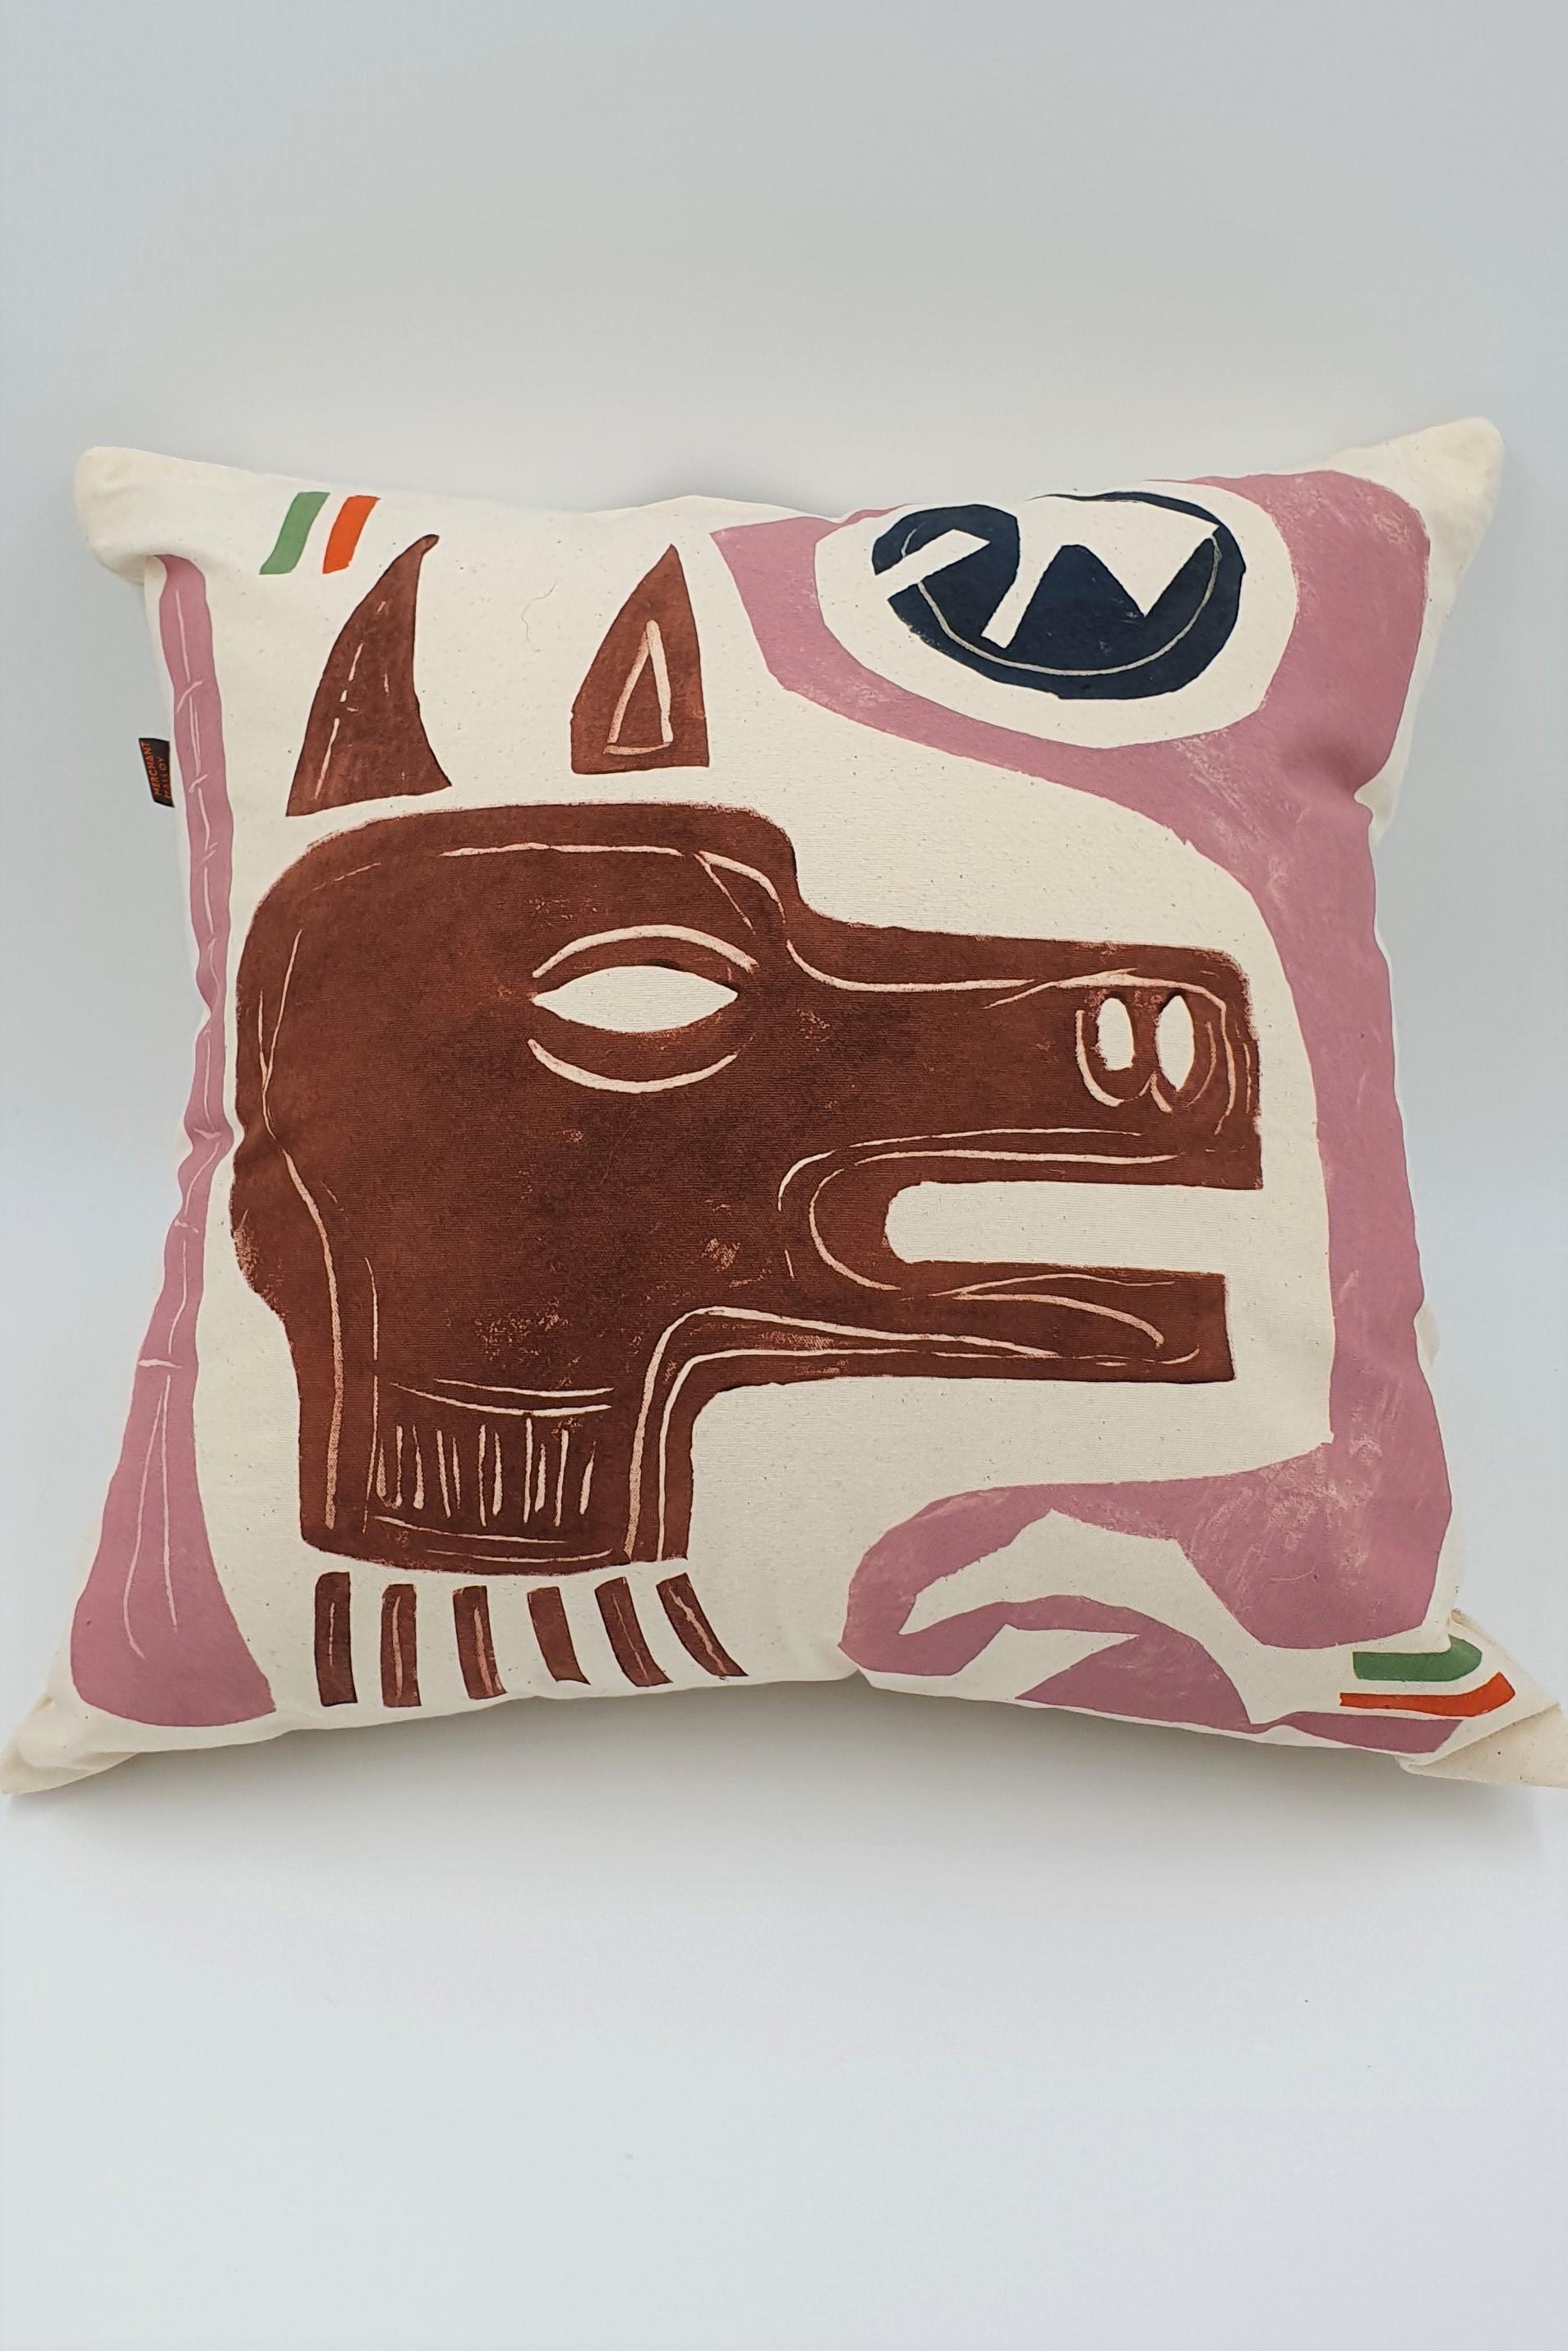 Merchant Malloy - canvas cushion covers